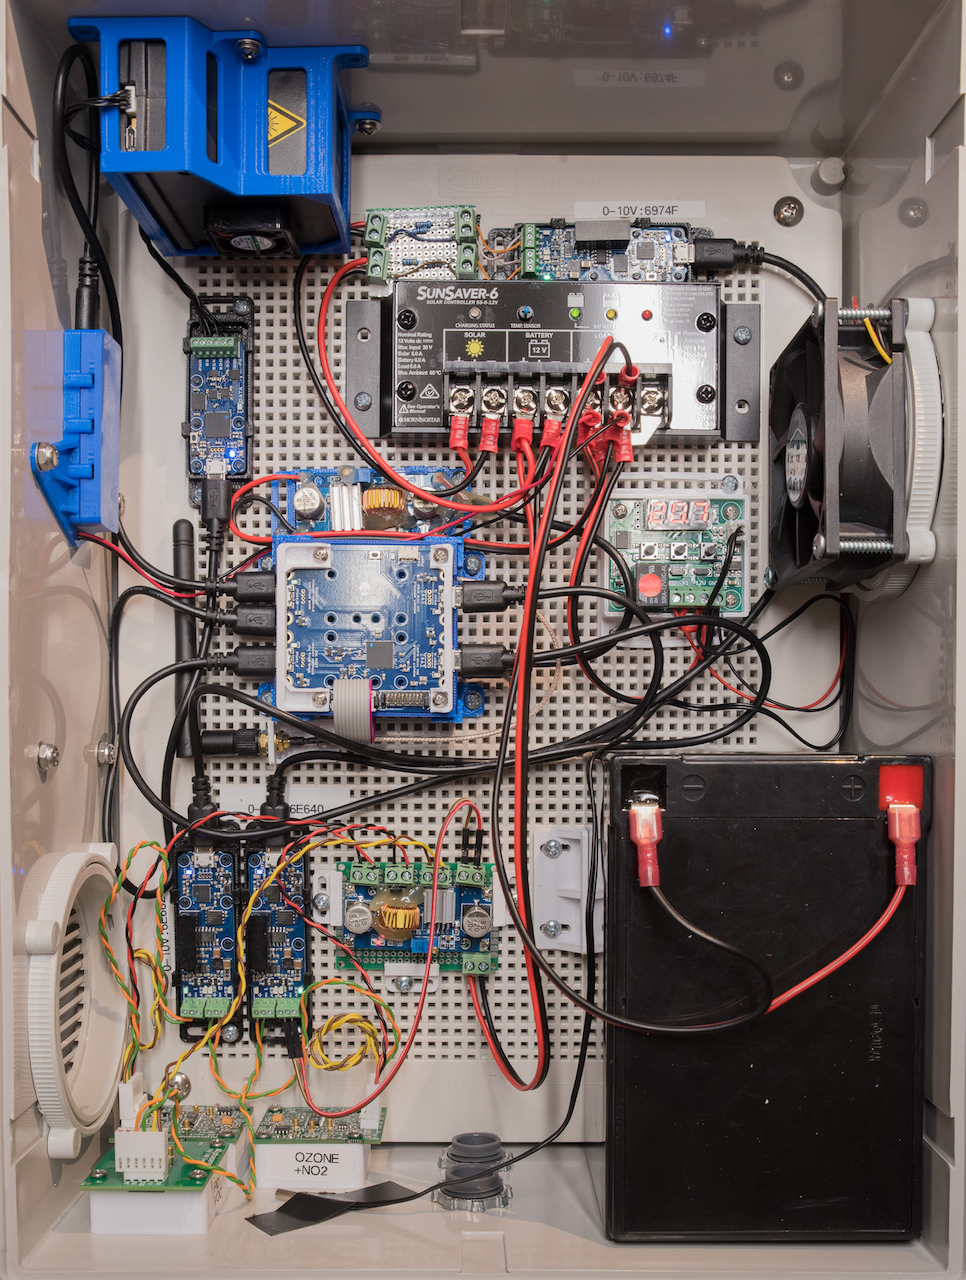 tools-valarm-net-valarm-tools-cloud-industrial-iot-remote-monitoring-sensor-telemetry-air-quality-water-gas-ozone-nitrogen-oxides-voc-vocs-airquality-pollution-exposure-pollutants-2